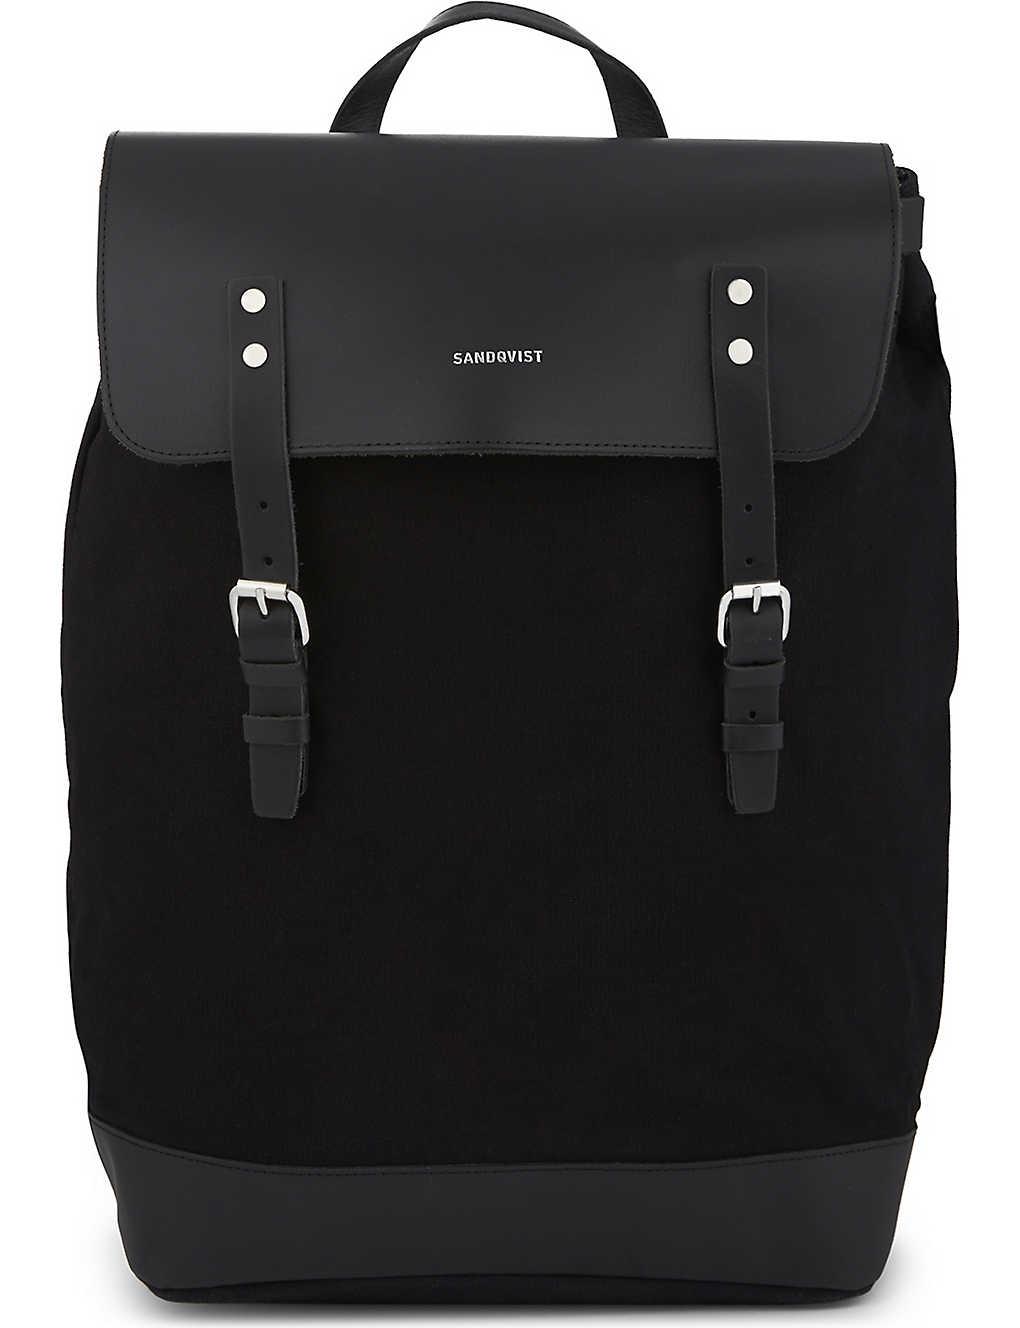 7691e1dbd275 SANDQVIST - Hege canvas backpack